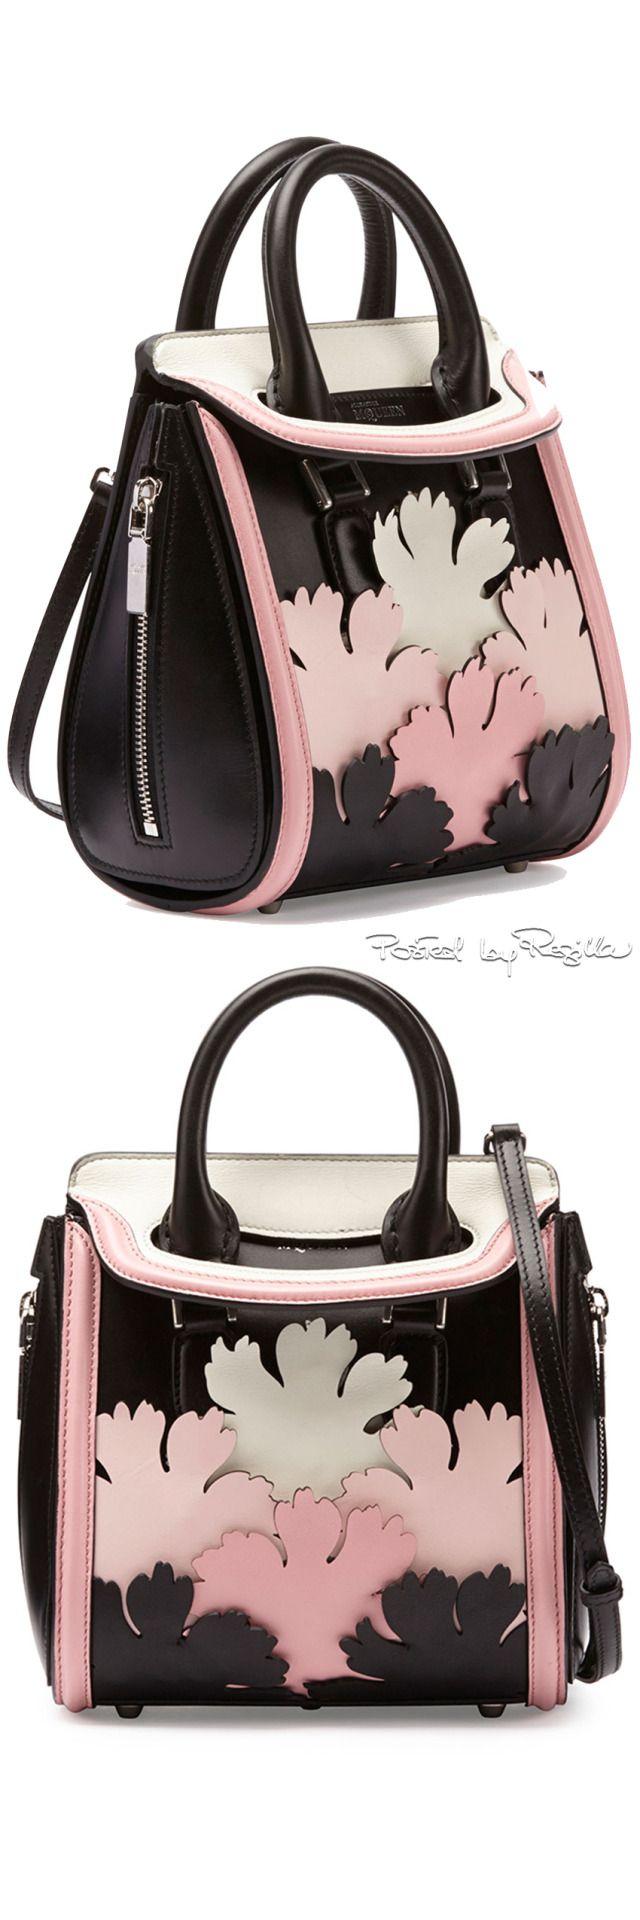 Regilla ⚜ Alexander McQueen, satchel with cutout leaf applique